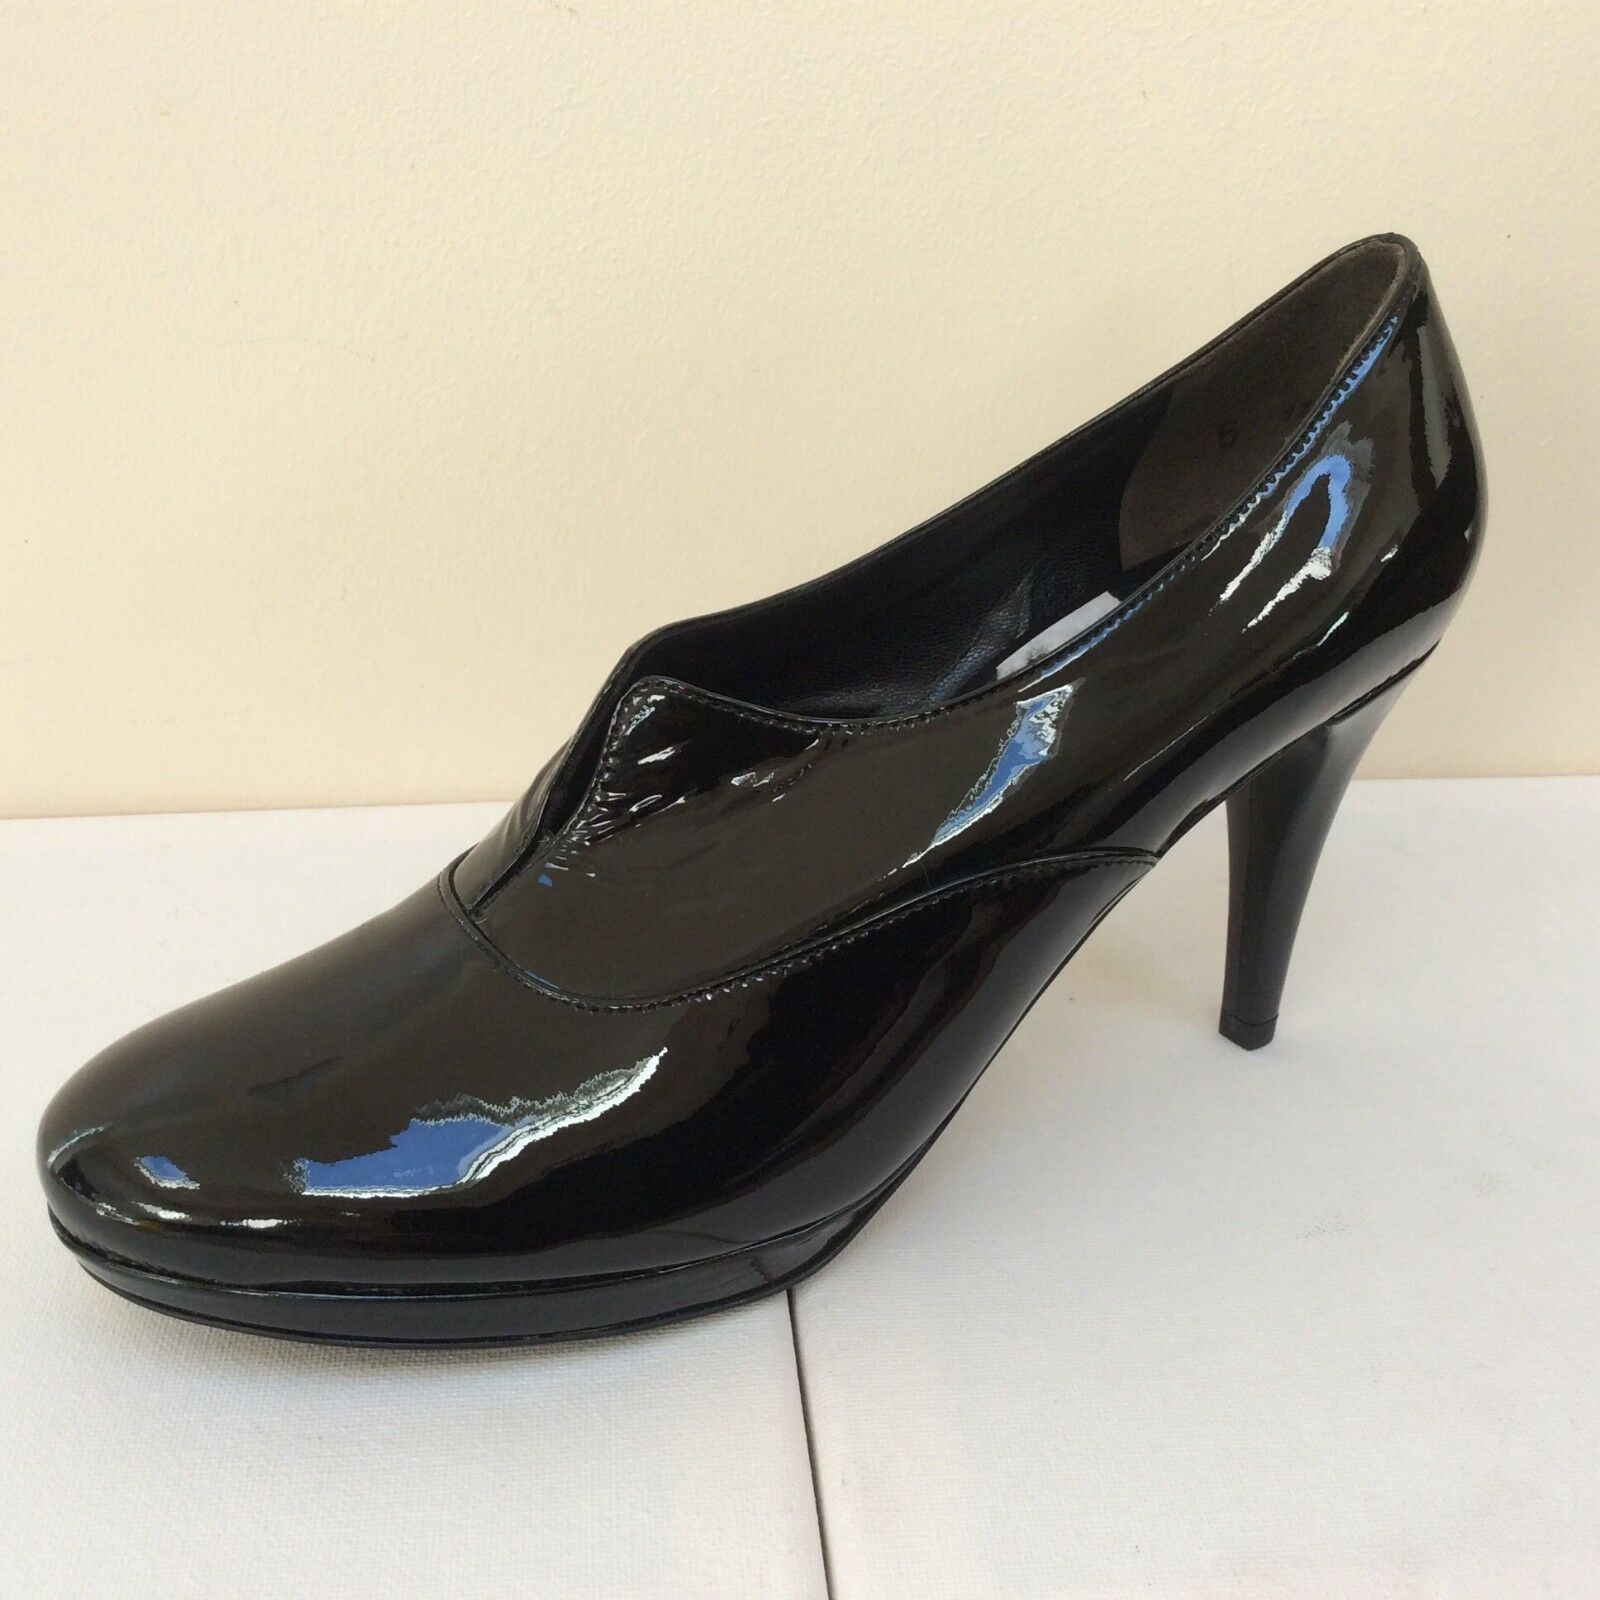 K&S Duffy noir patent court chaussures, UK 6 EU 39,   BNWB